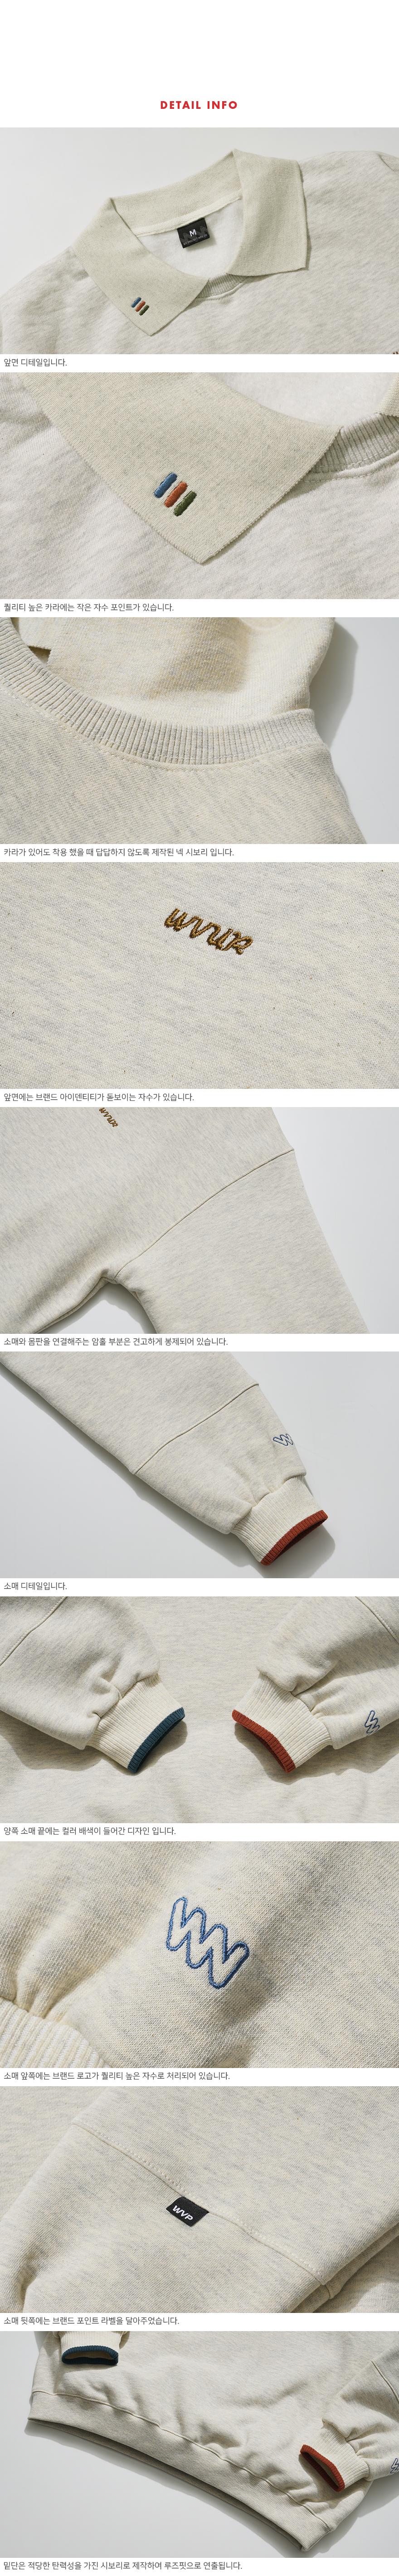 MJMT7514_detail_oatmeal_ji.jpg